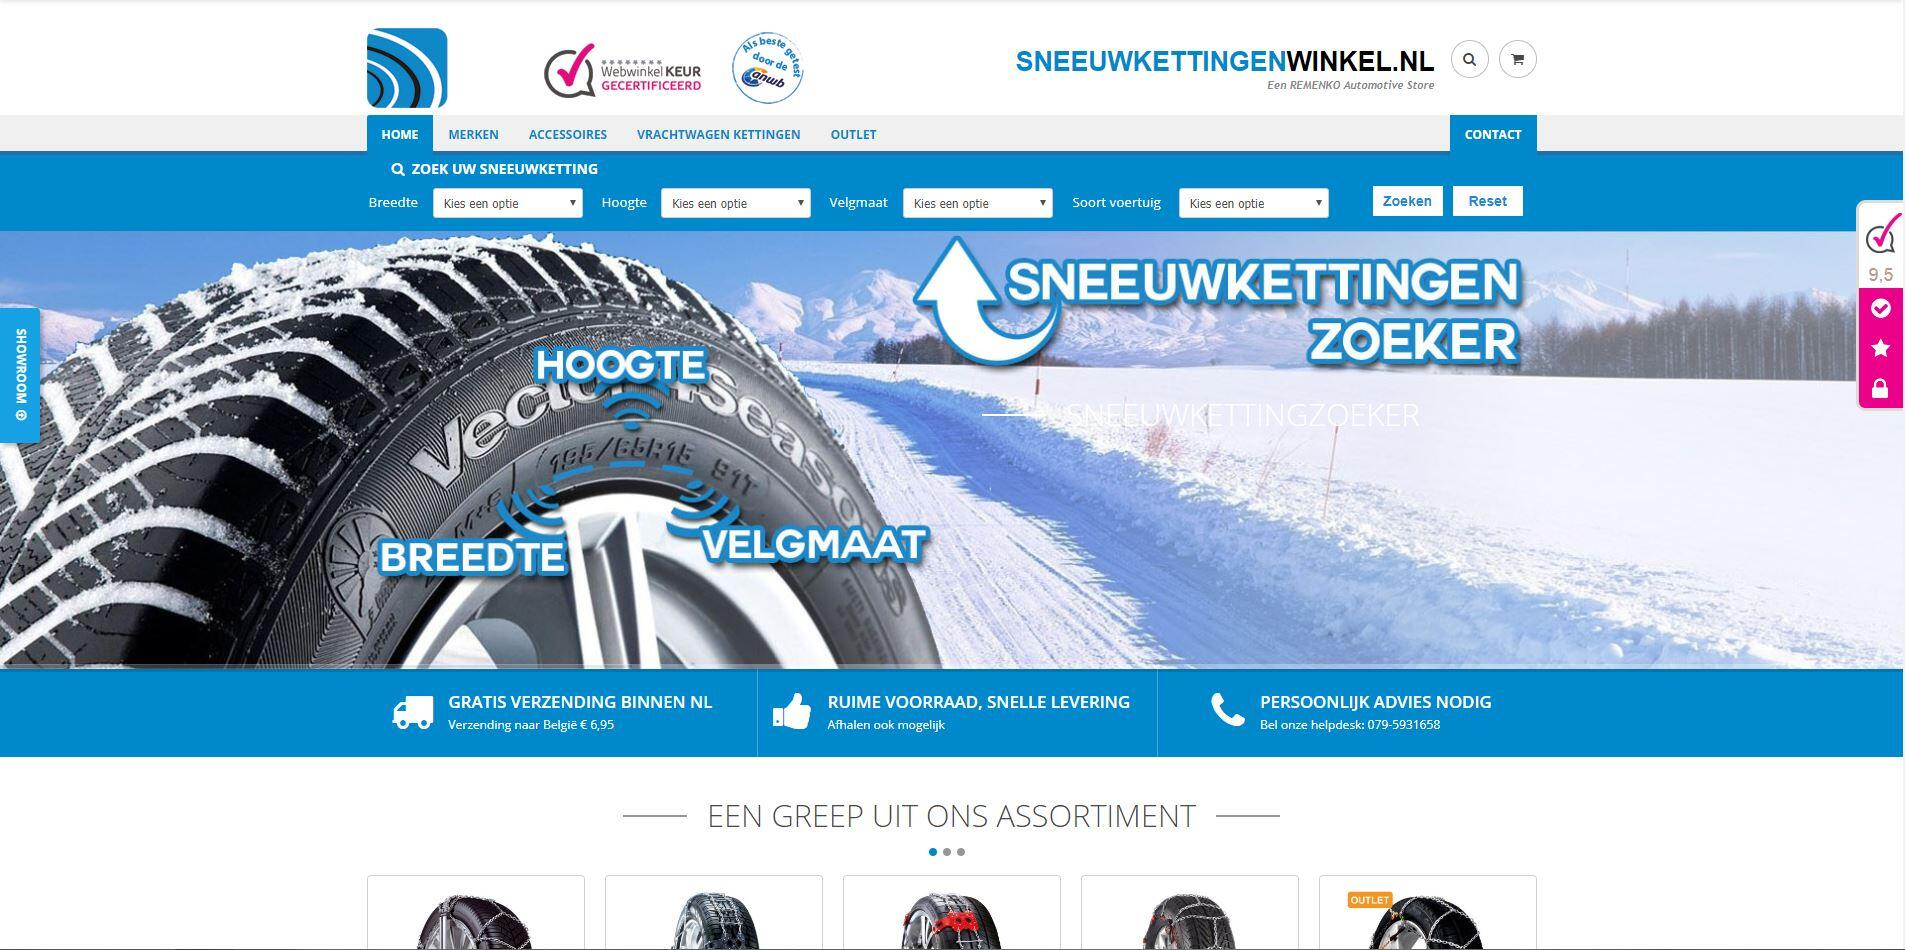 VirtueMart webshop